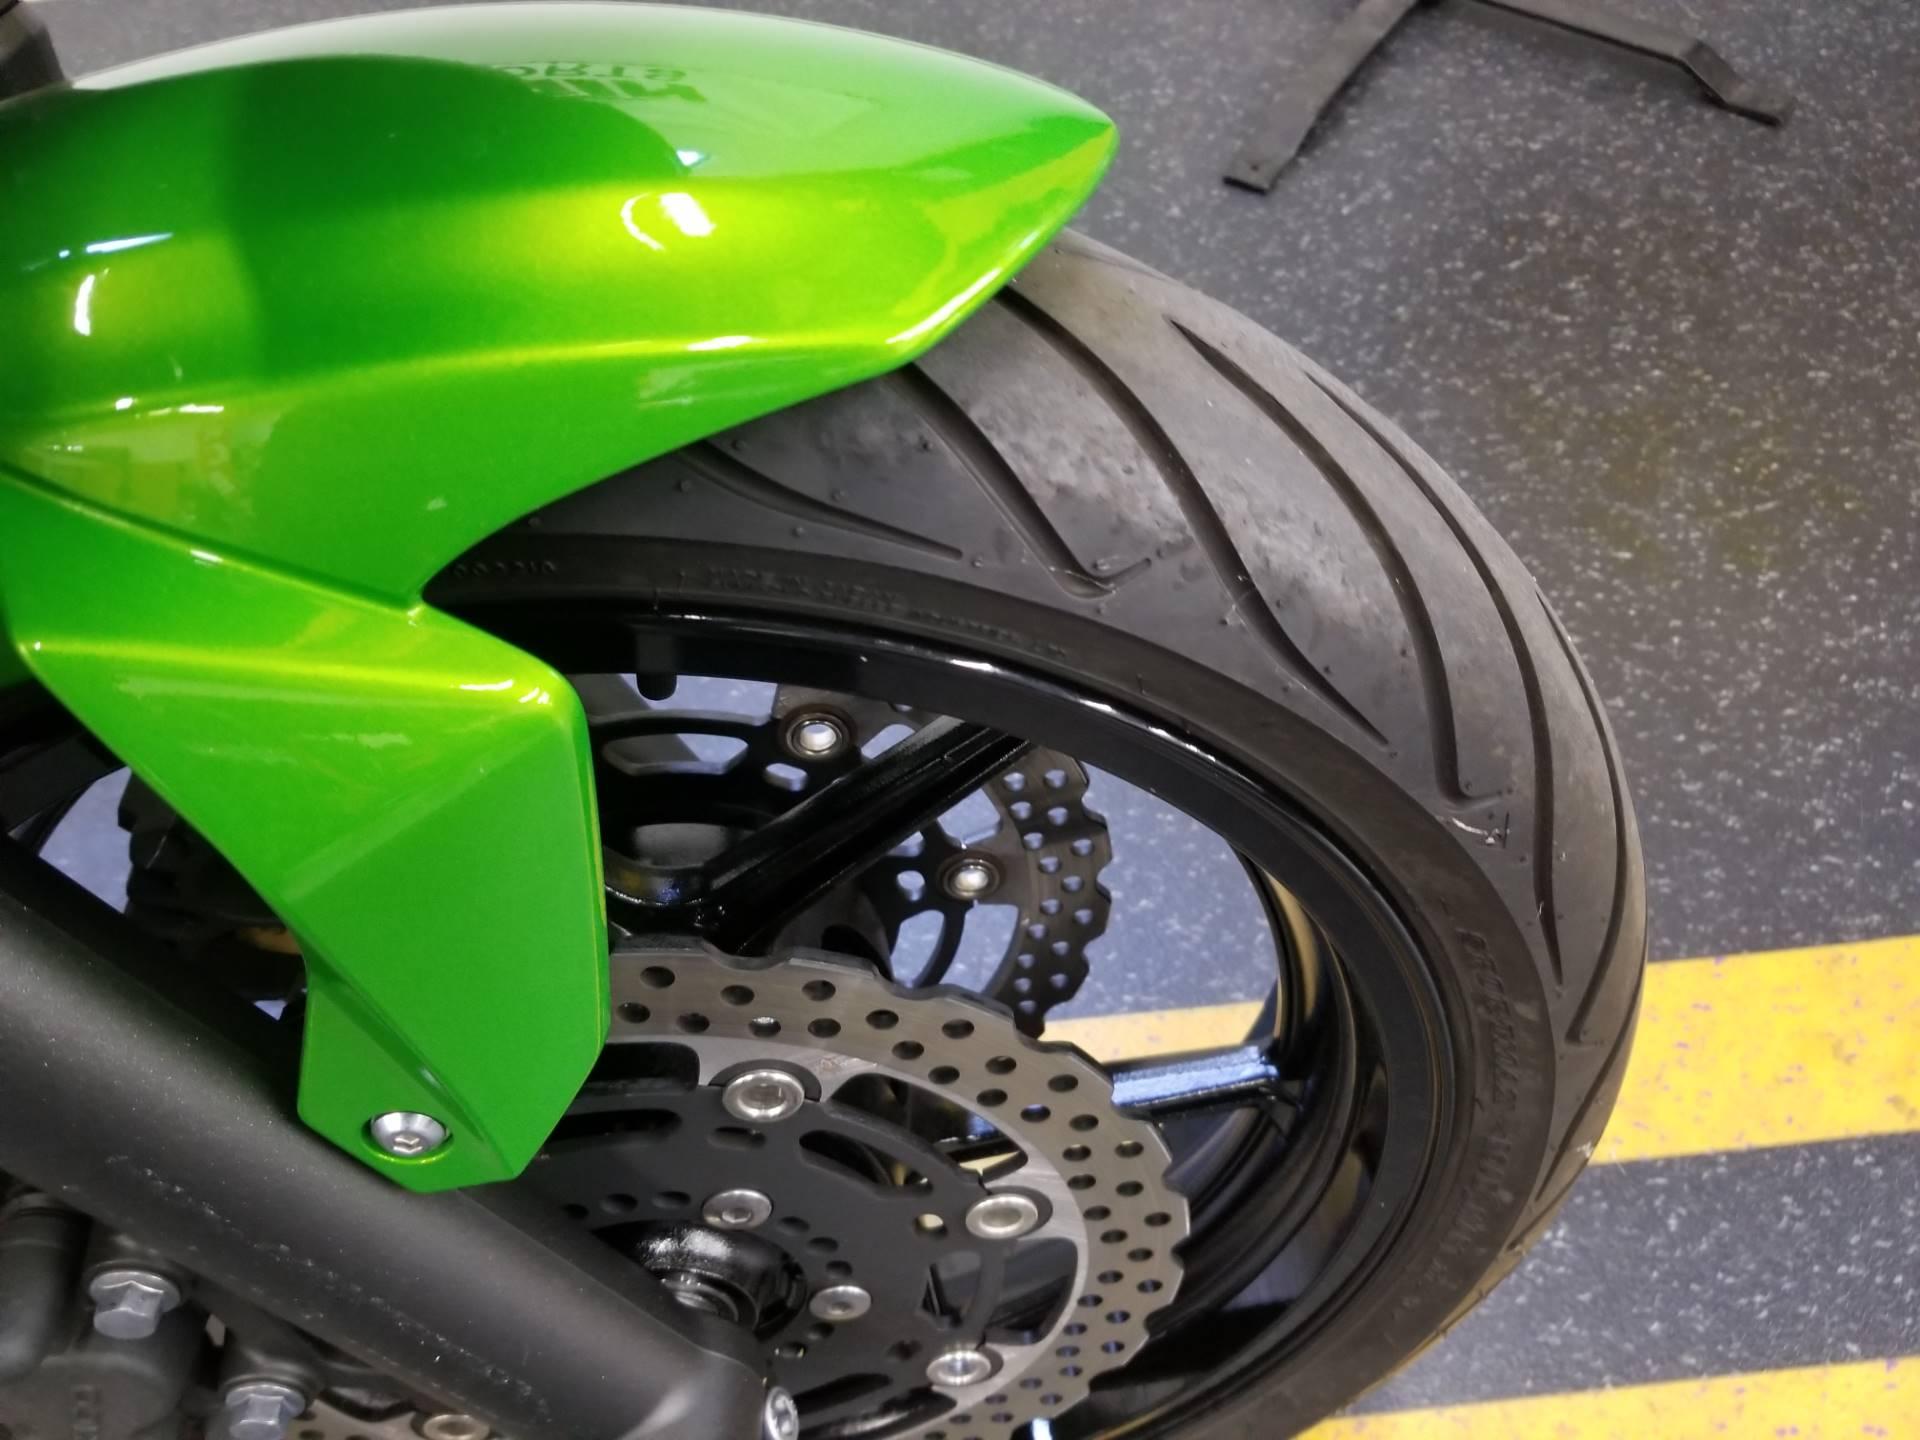 2012 Kawasaki Ninja 650 5